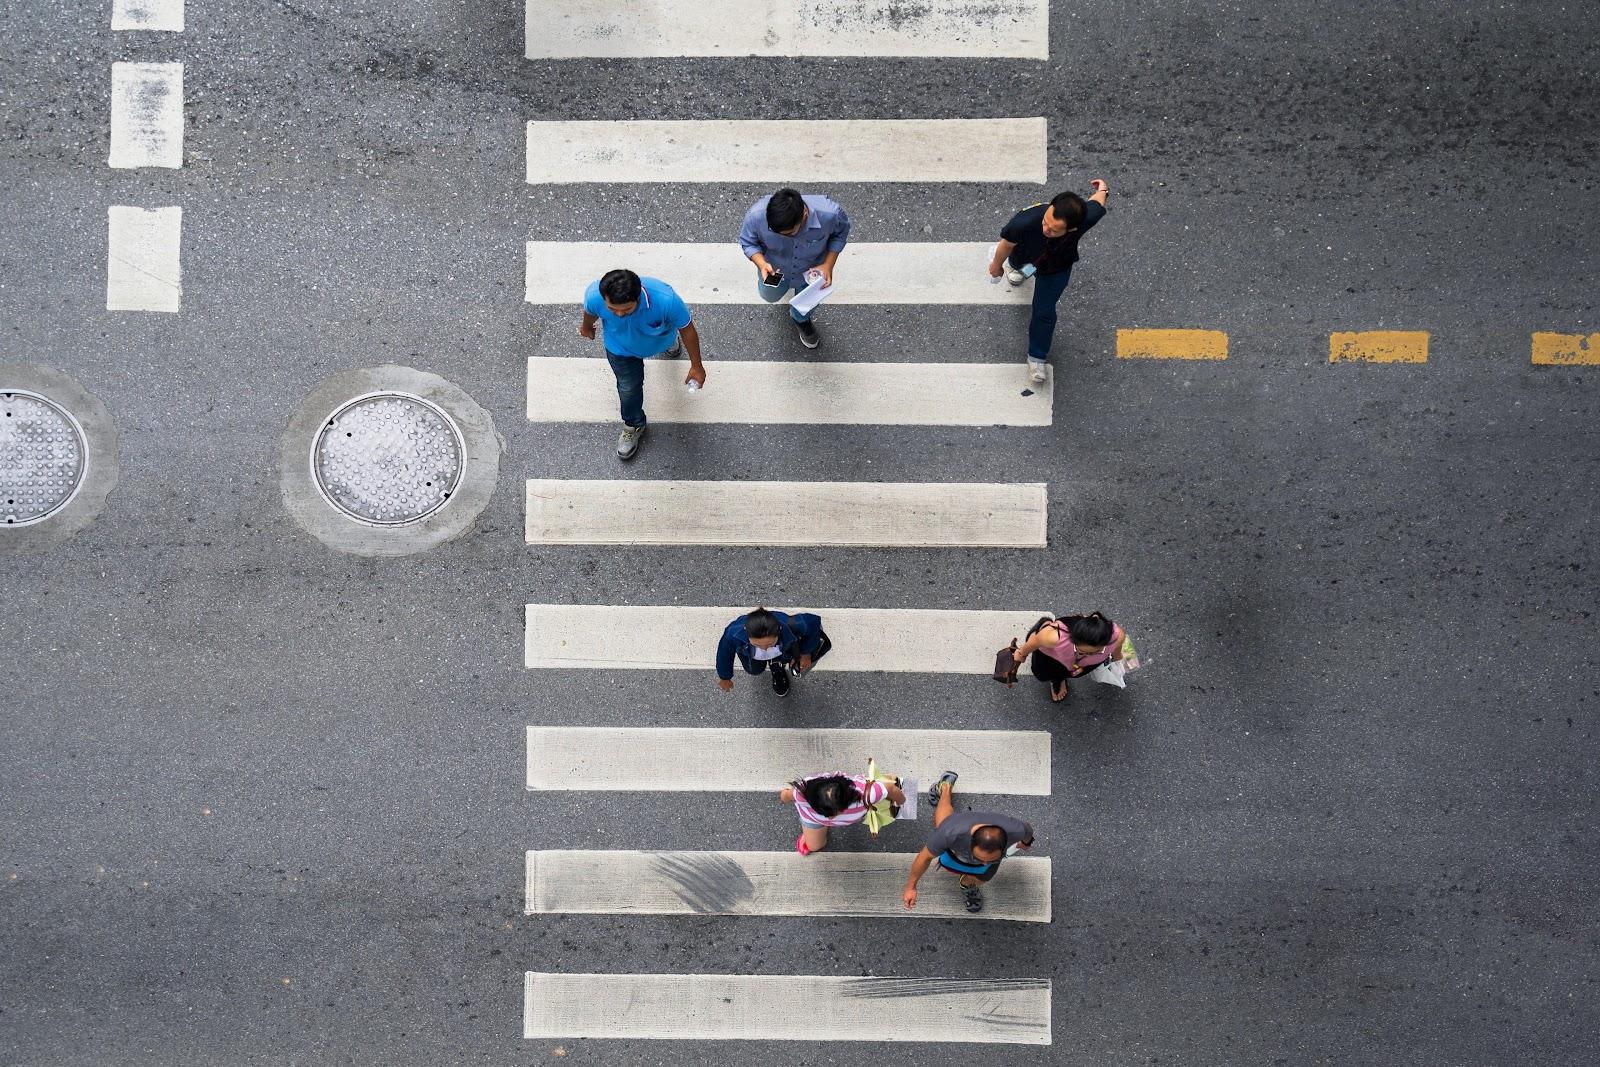 Birds-eye view of pedestrians following crosswalk markings at an intersection.